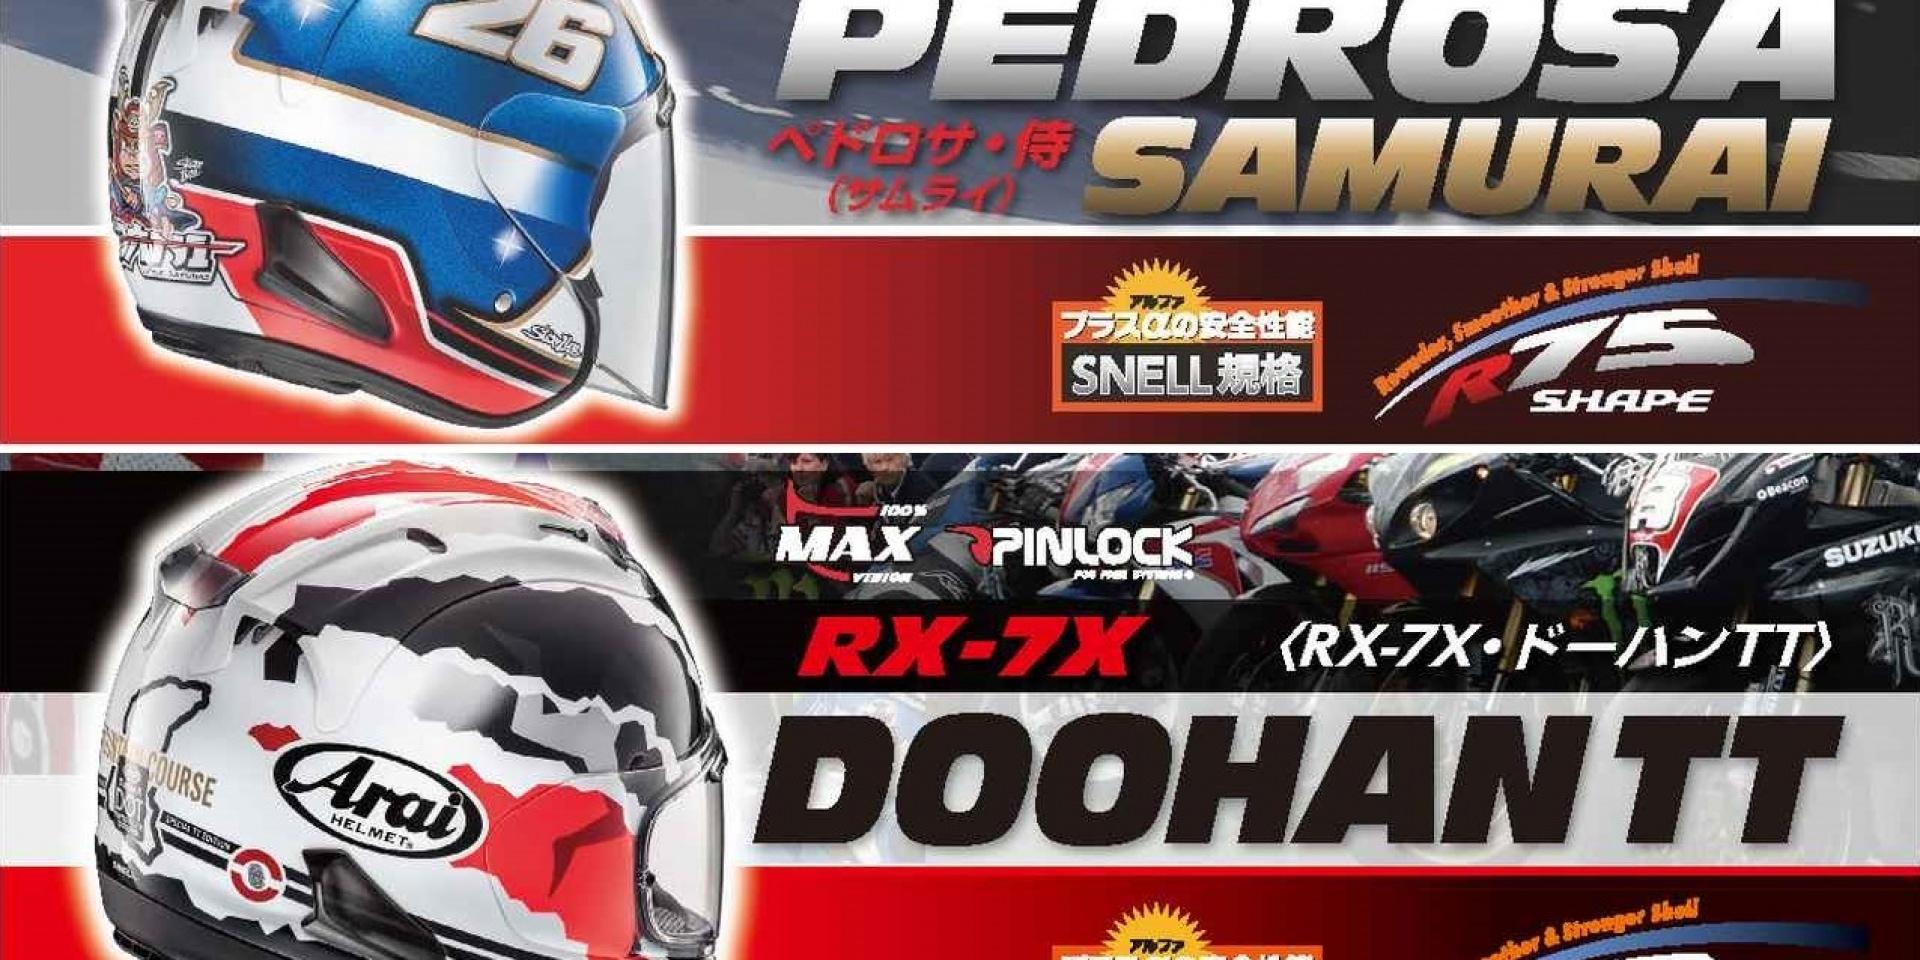 ARAI RX 7X Doohan TT/ SZ-Ram4x Pedrosa 彩繪帽新上市